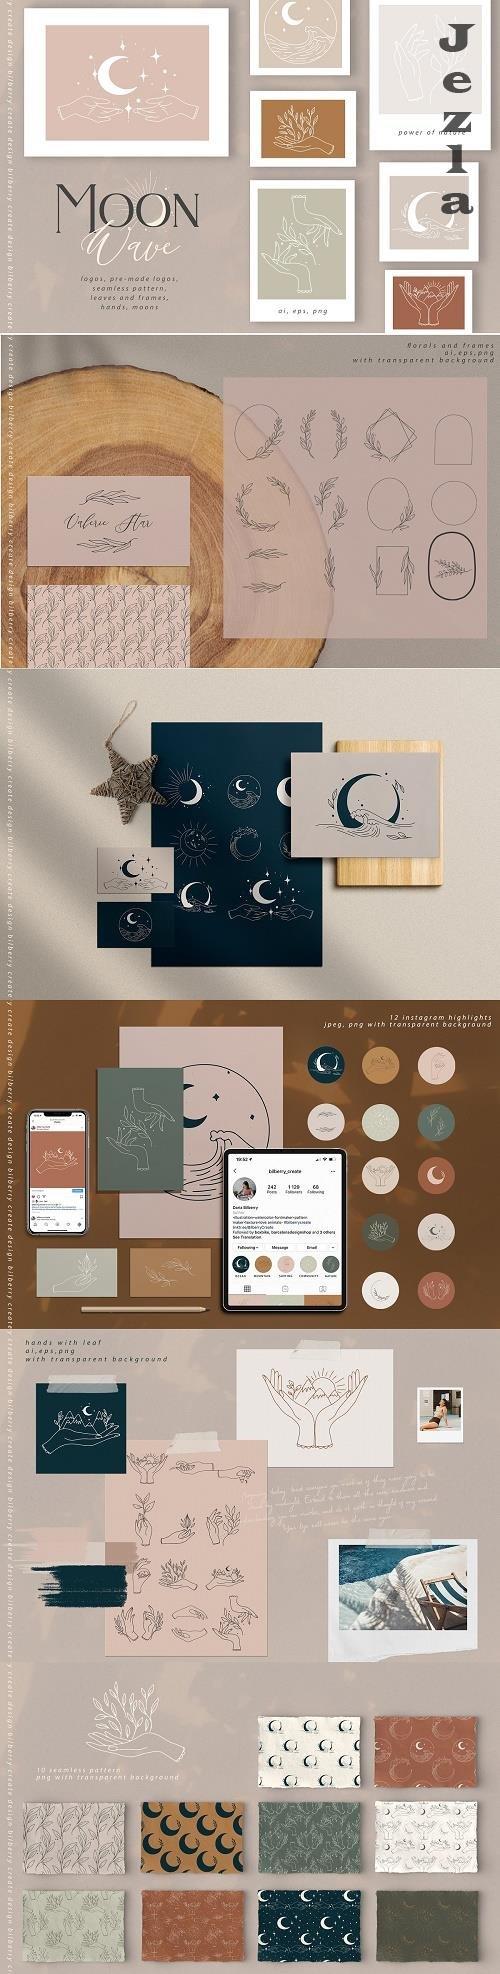 Moon Wave graphic art set - 4599311